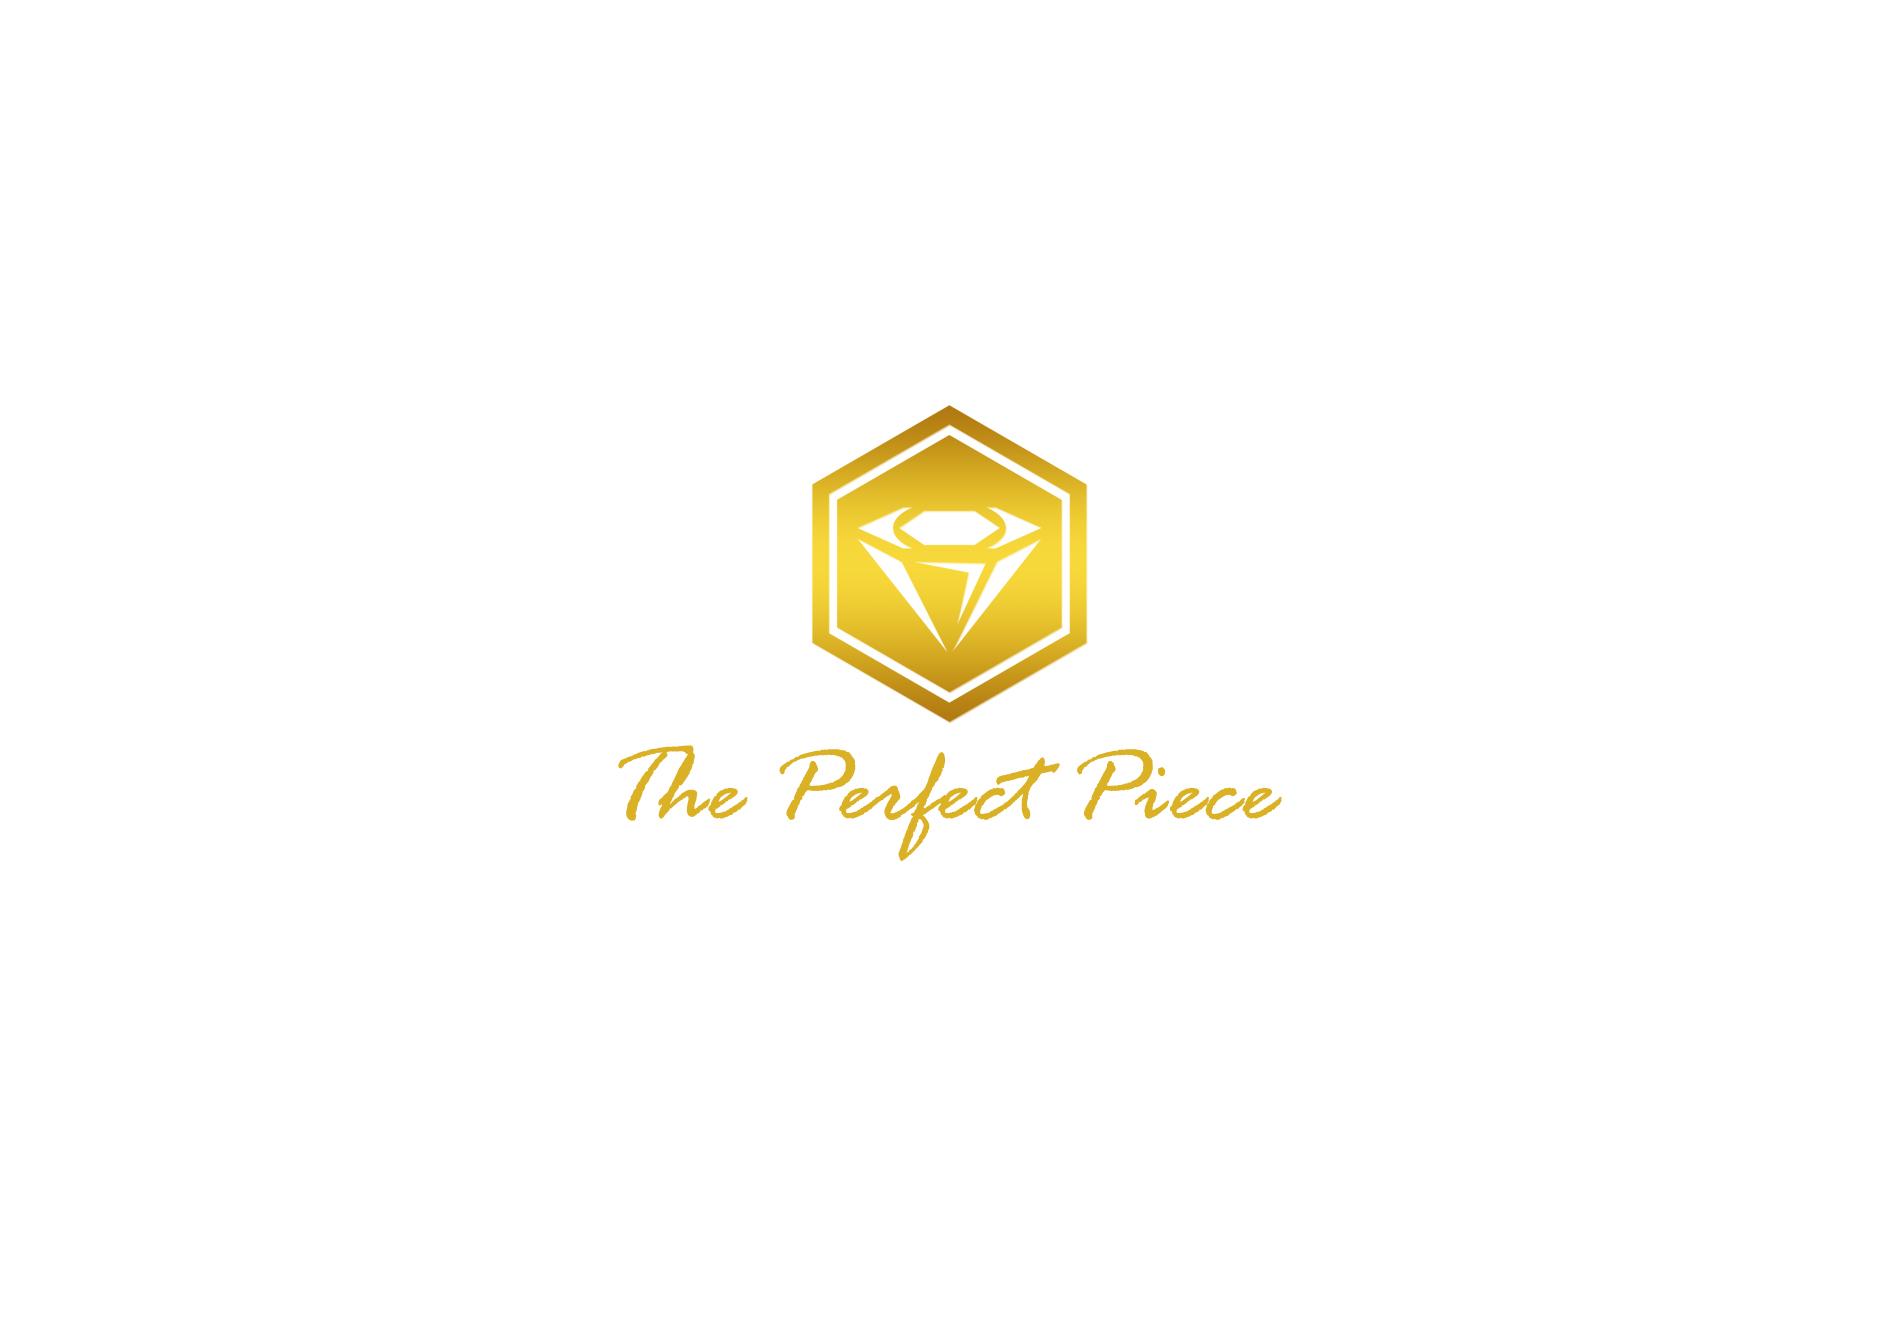 Logo Design by Brix Estanilla - Entry No. 16 in the Logo Design Contest Unique Logo Design Wanted for The Perfect Piece.